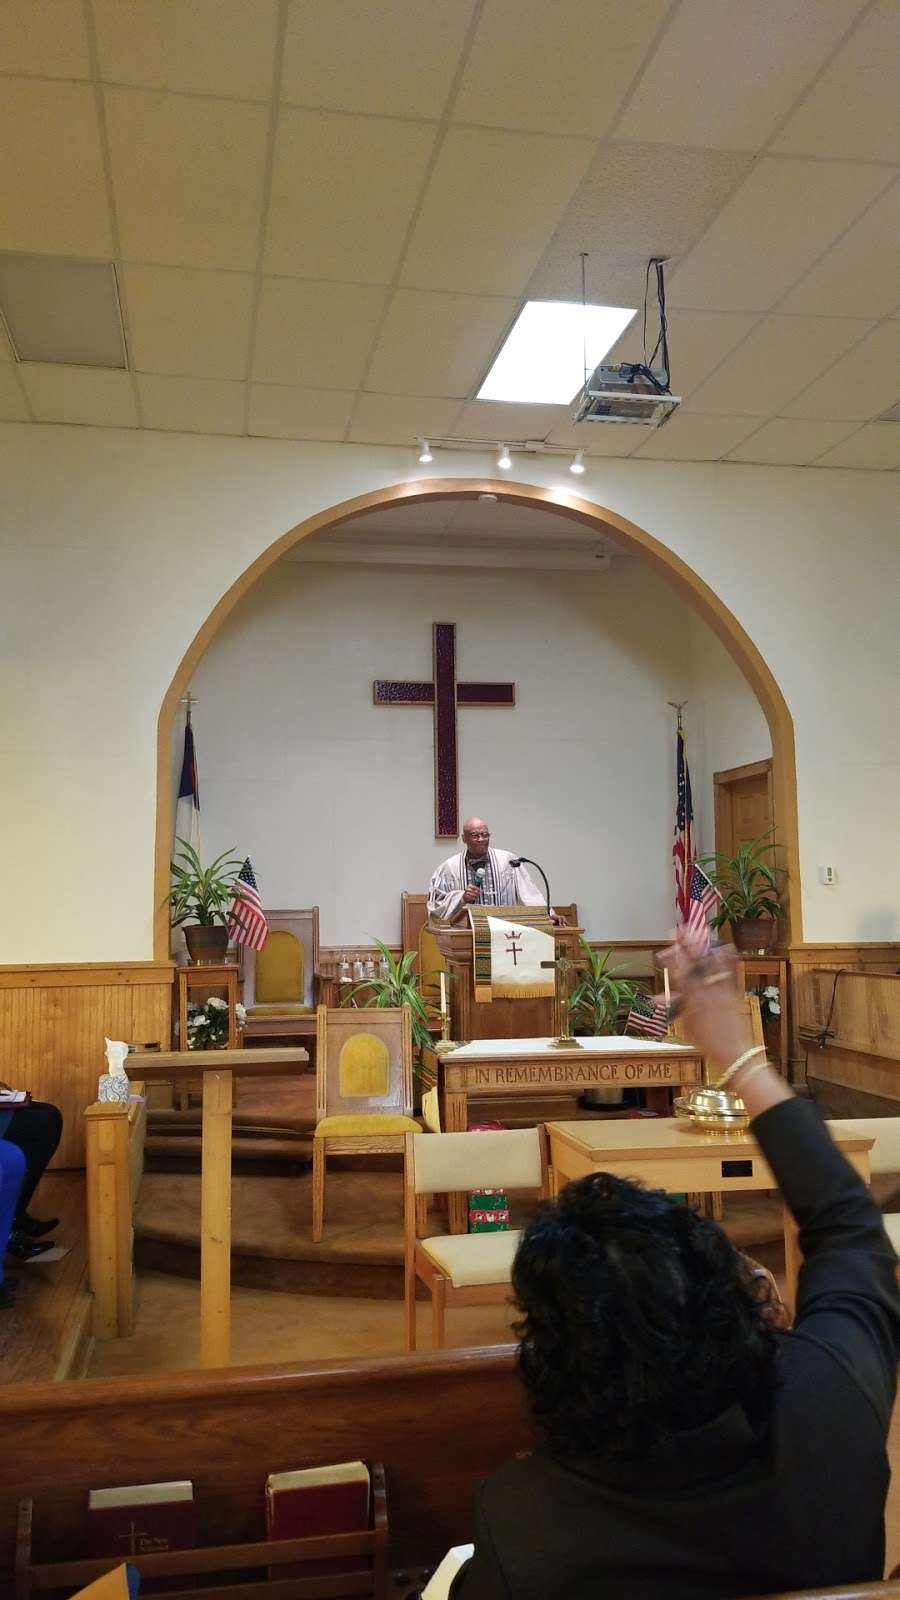 Flat Rock Baptist Church - church    Photo 1 of 2   Address: 111 Carver St, York, SC 29745, USA   Phone: (803) 222-4517